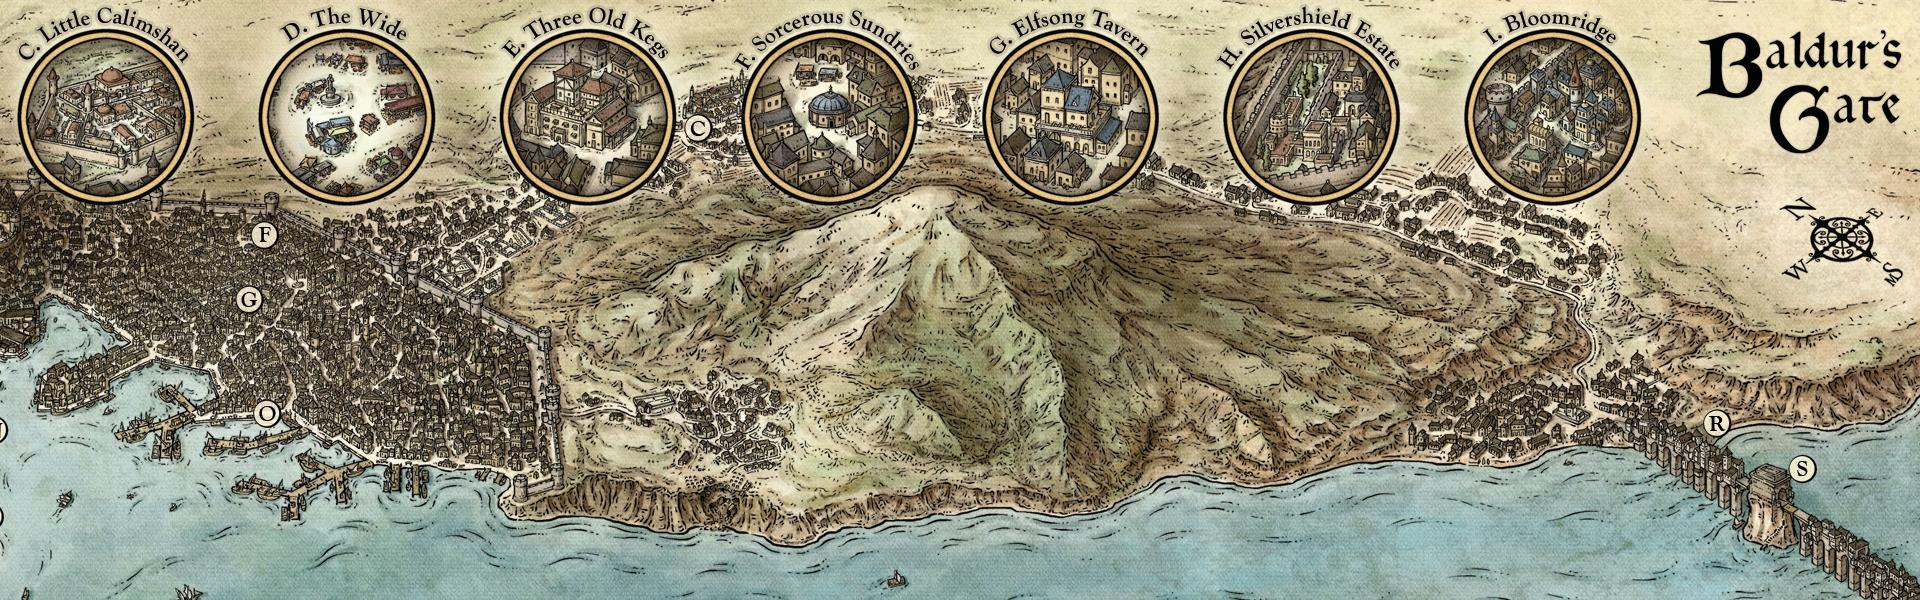 Murder in Baldur's Gate